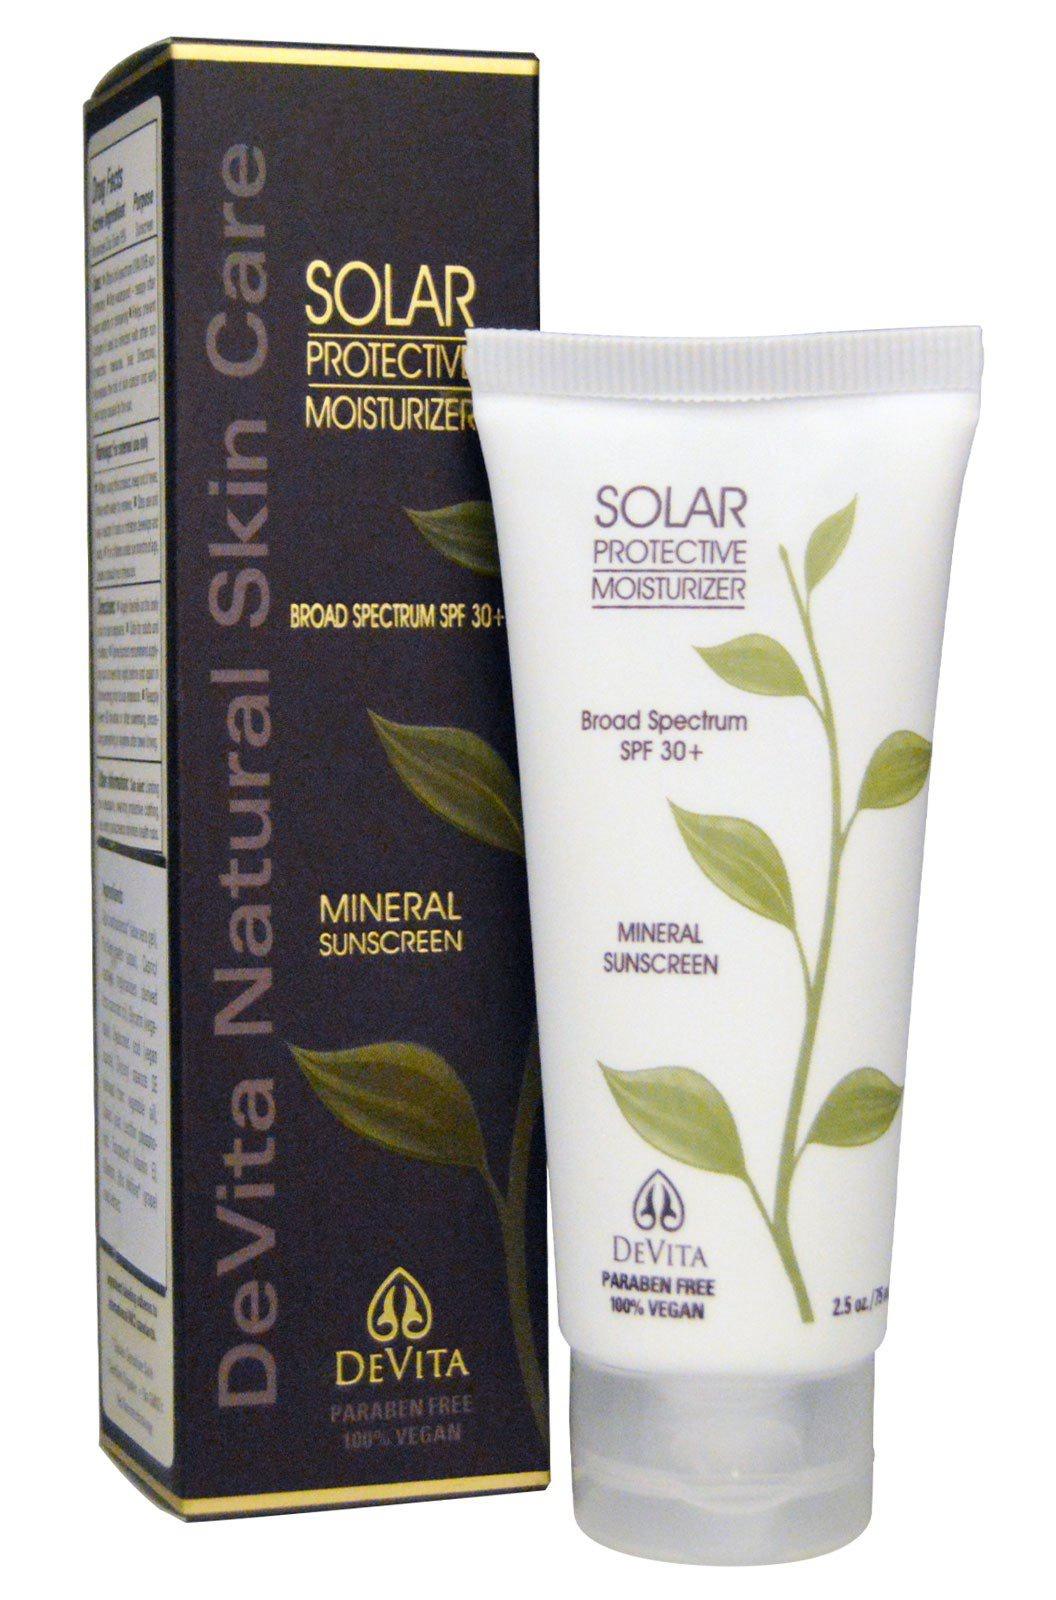 DeVita Solar Protective Moisturizer SPF 30+